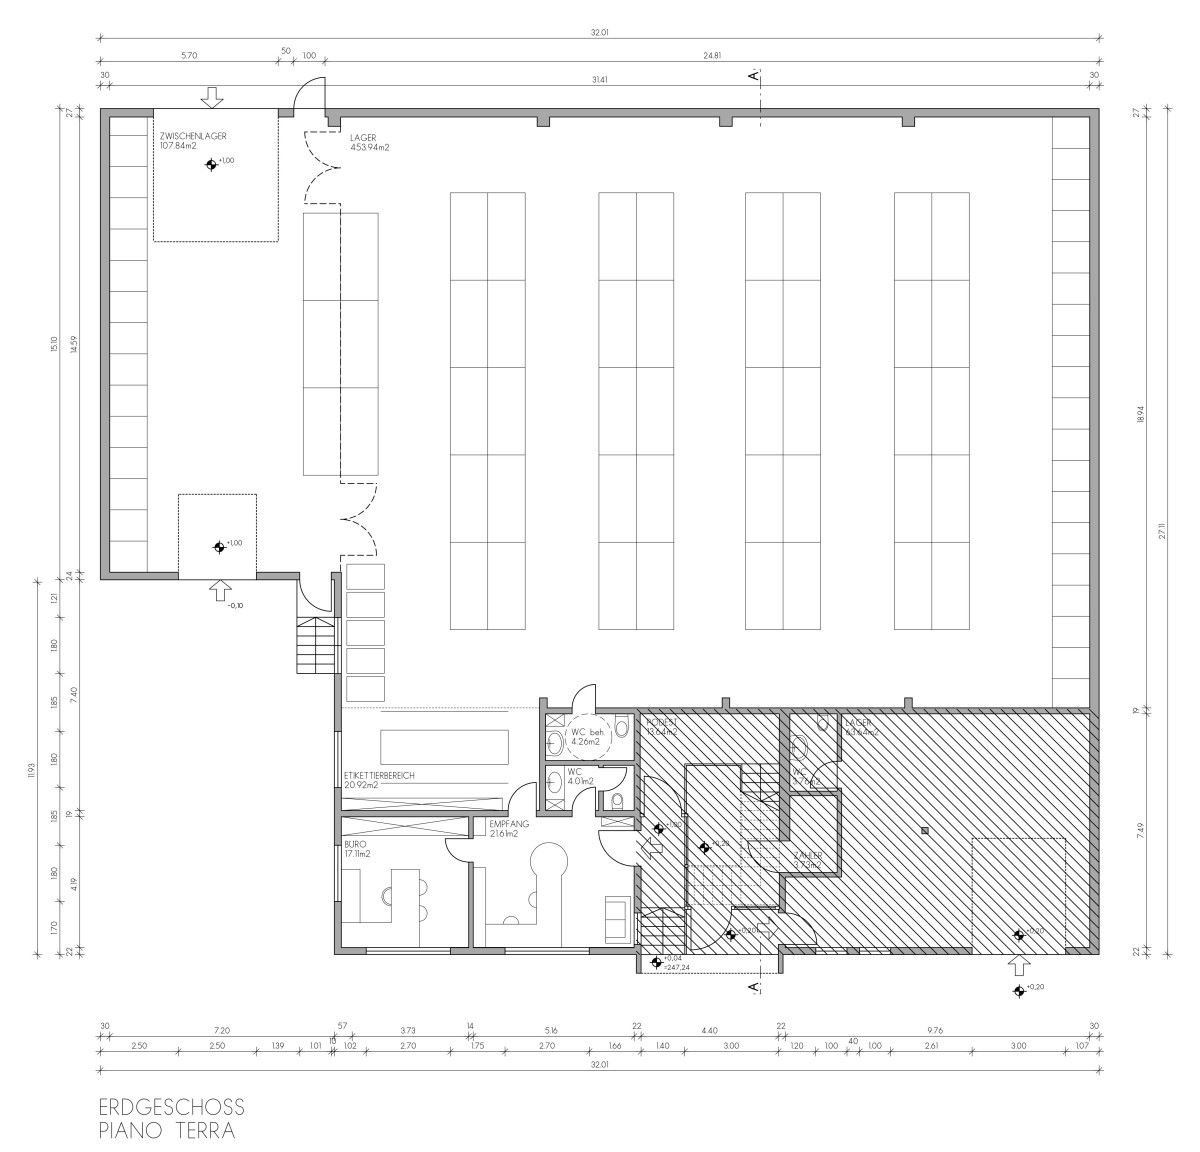 Plan Erdgeschoss - pianta piano terra